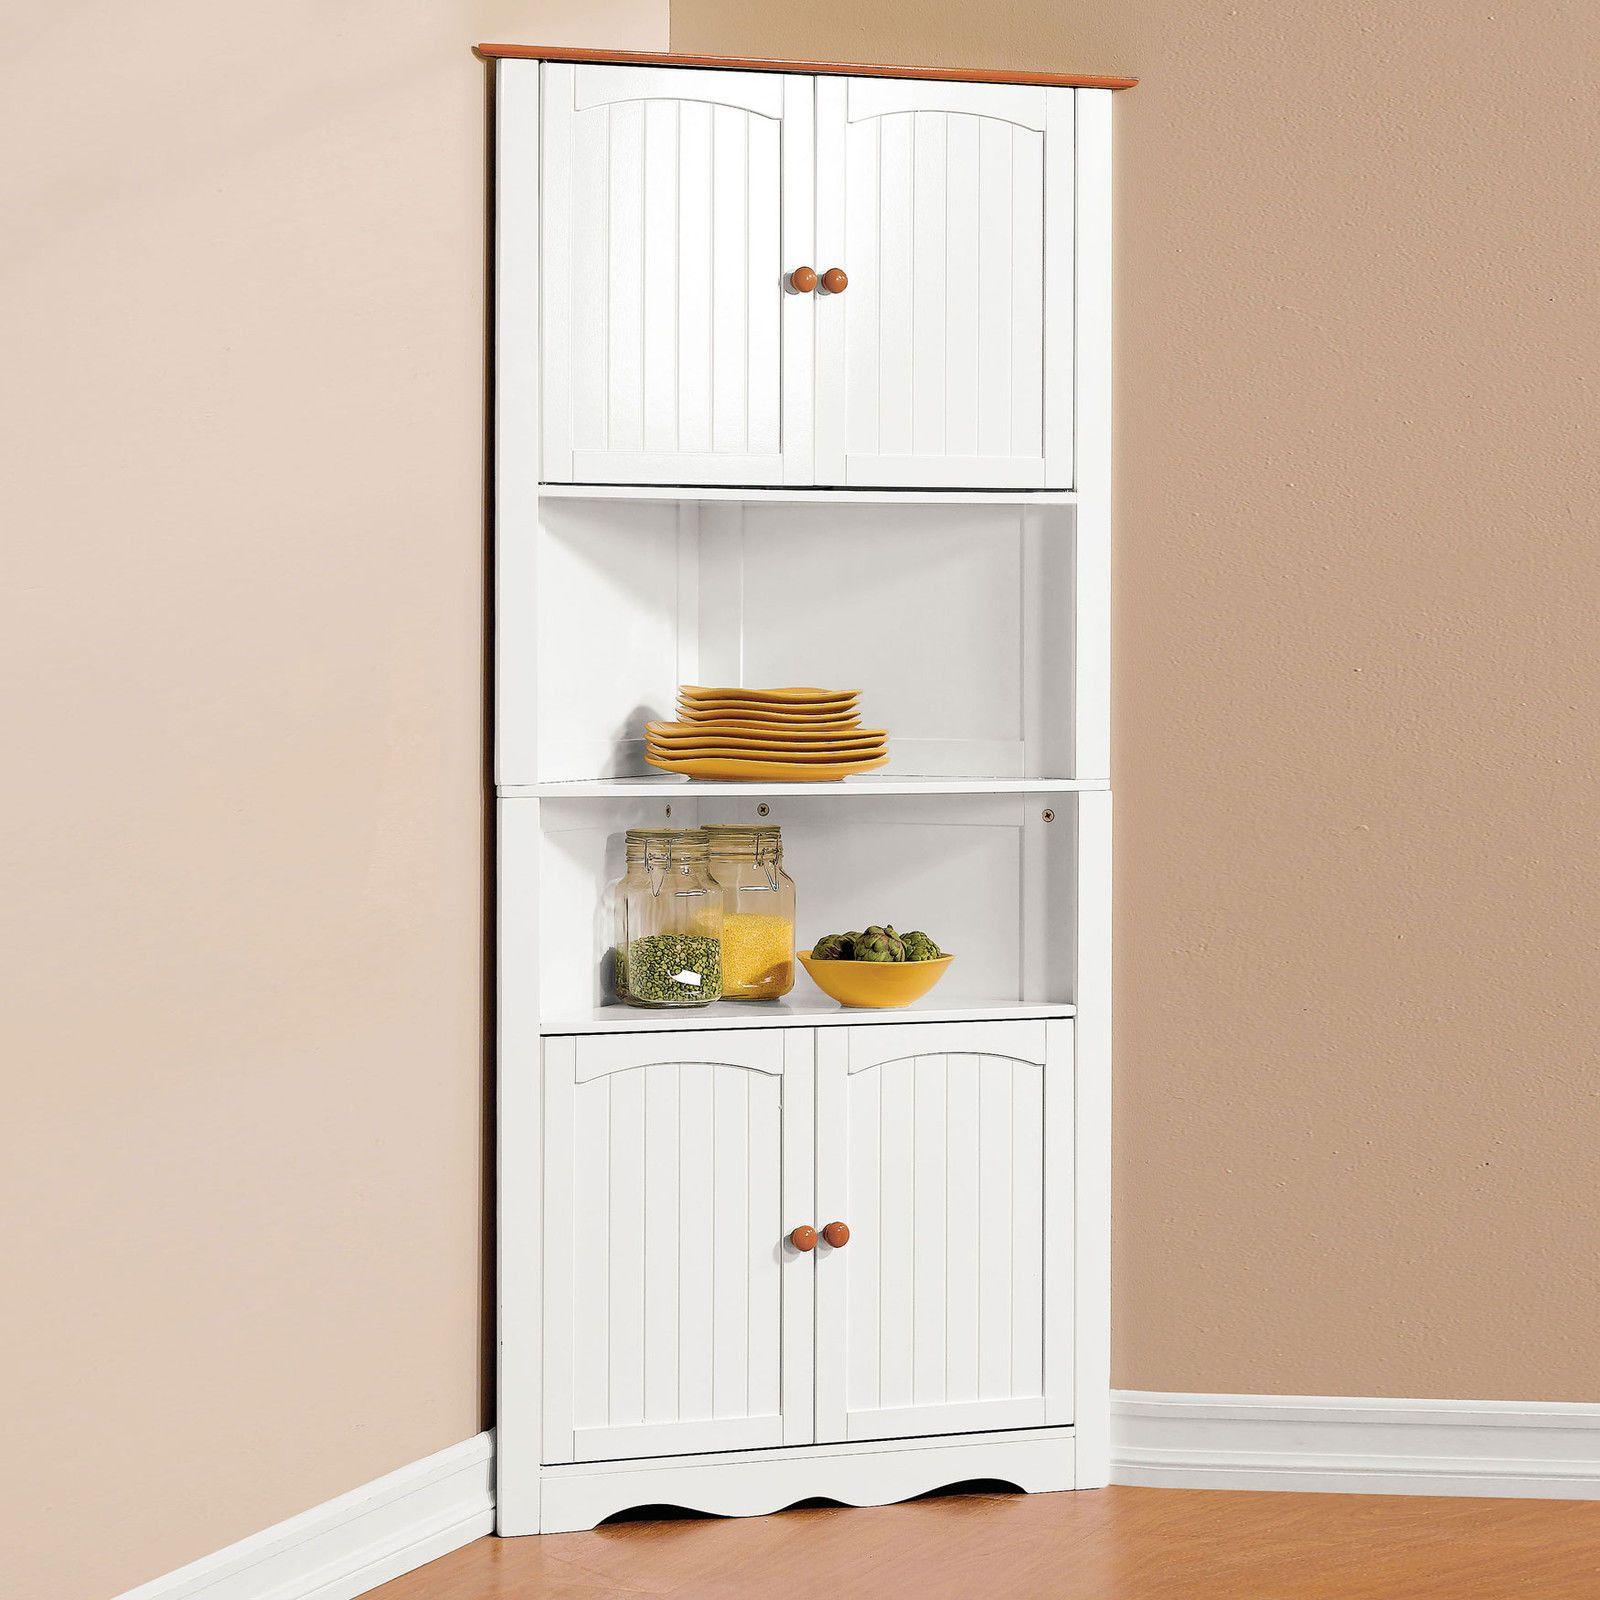 Ebay White Kitchen Cabinets Tall White Kitchen Cupboard Innovative Corner Storage Cabi